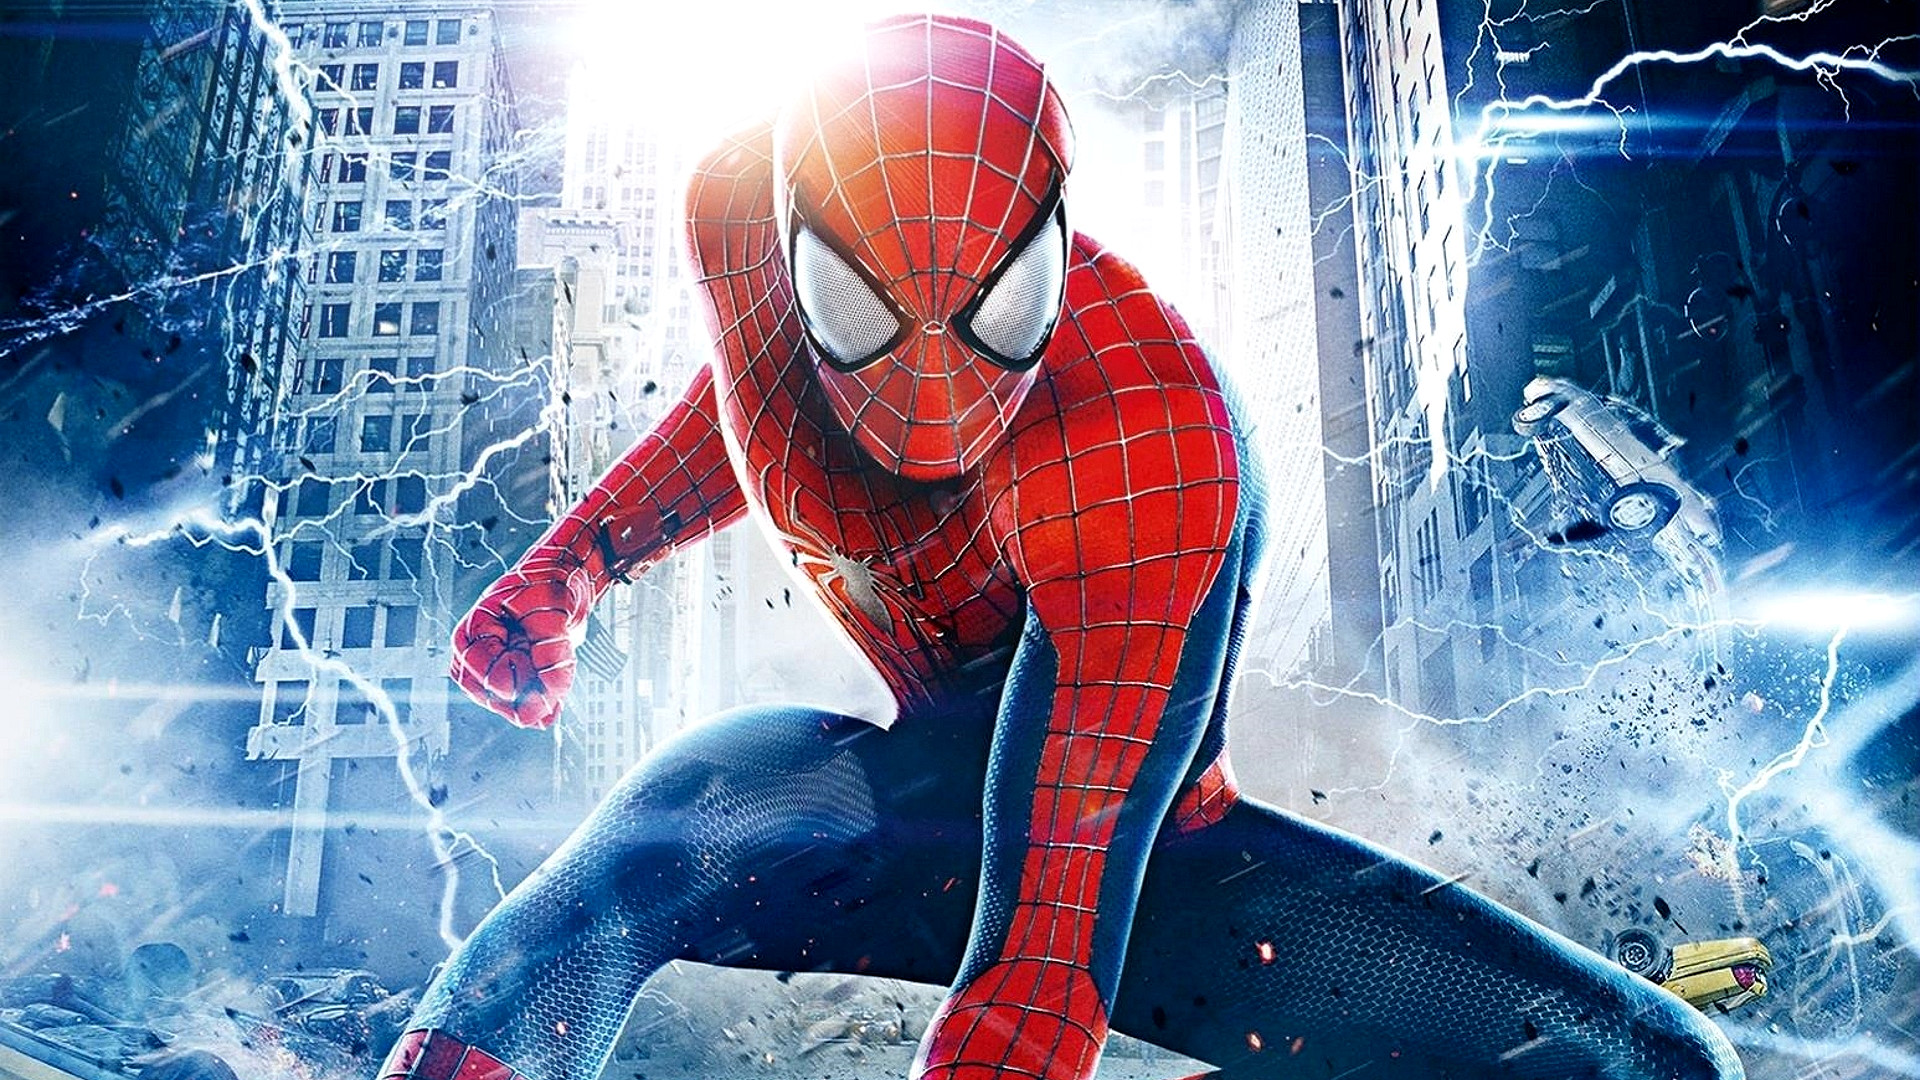 Spider Man Wallpaper (83 Wallpapers)